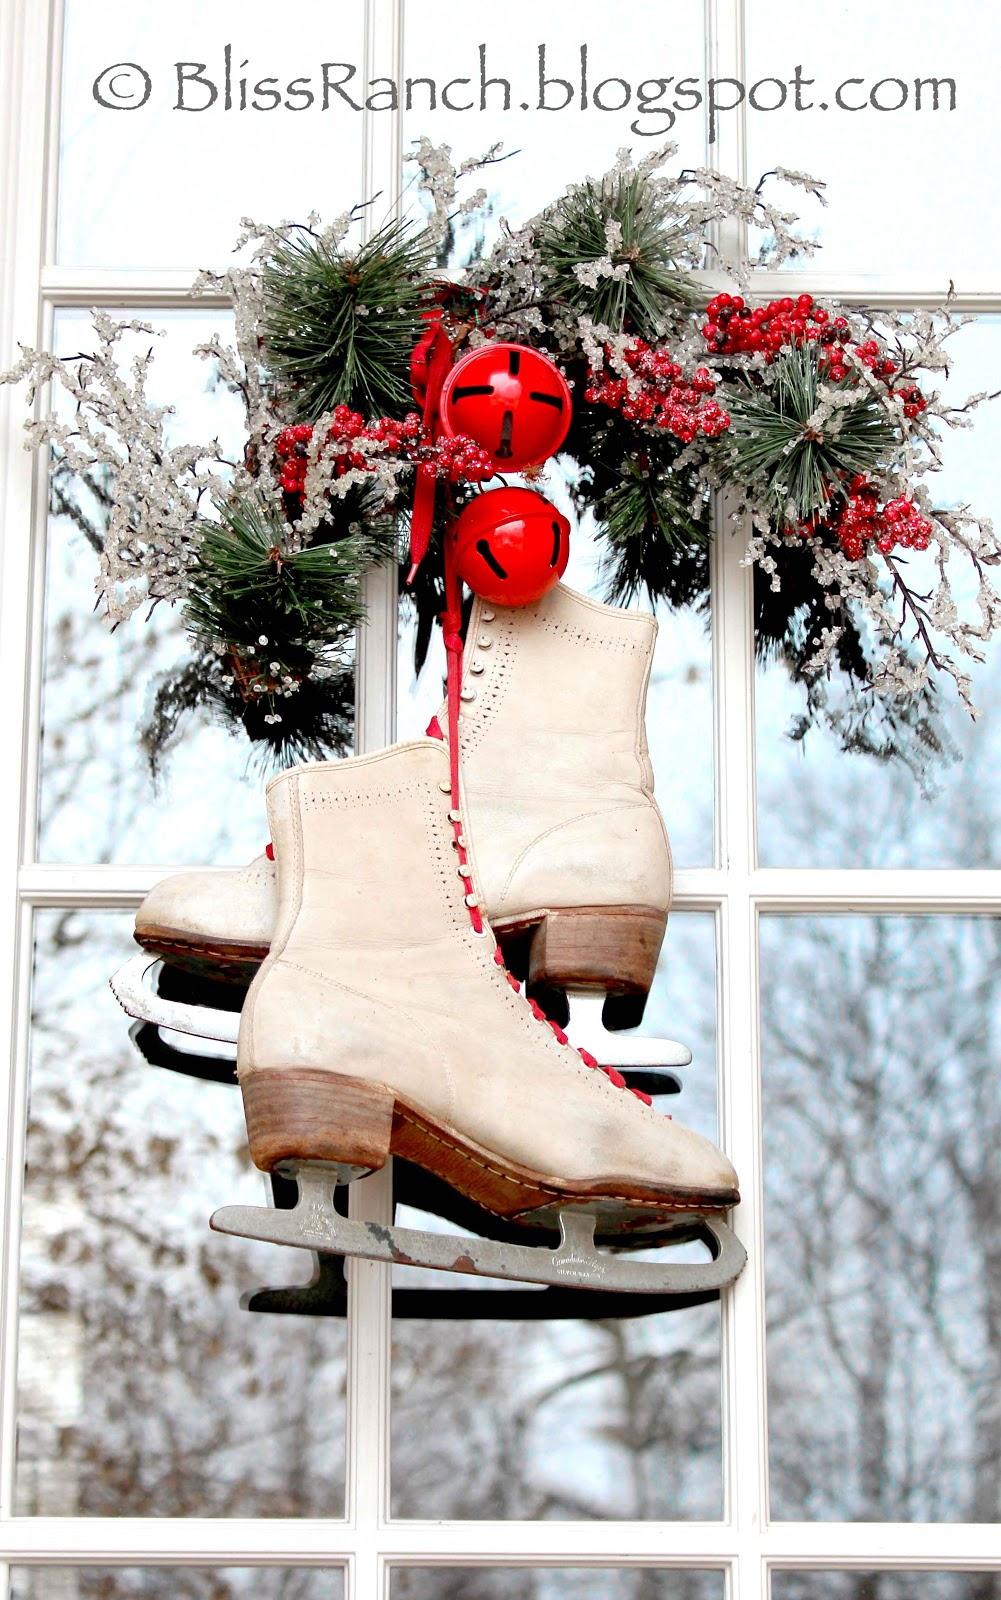 Xmas Vintage Ice Skates Fiber Optic Wreath Wall Hanging Ice Skates Holiday Gift